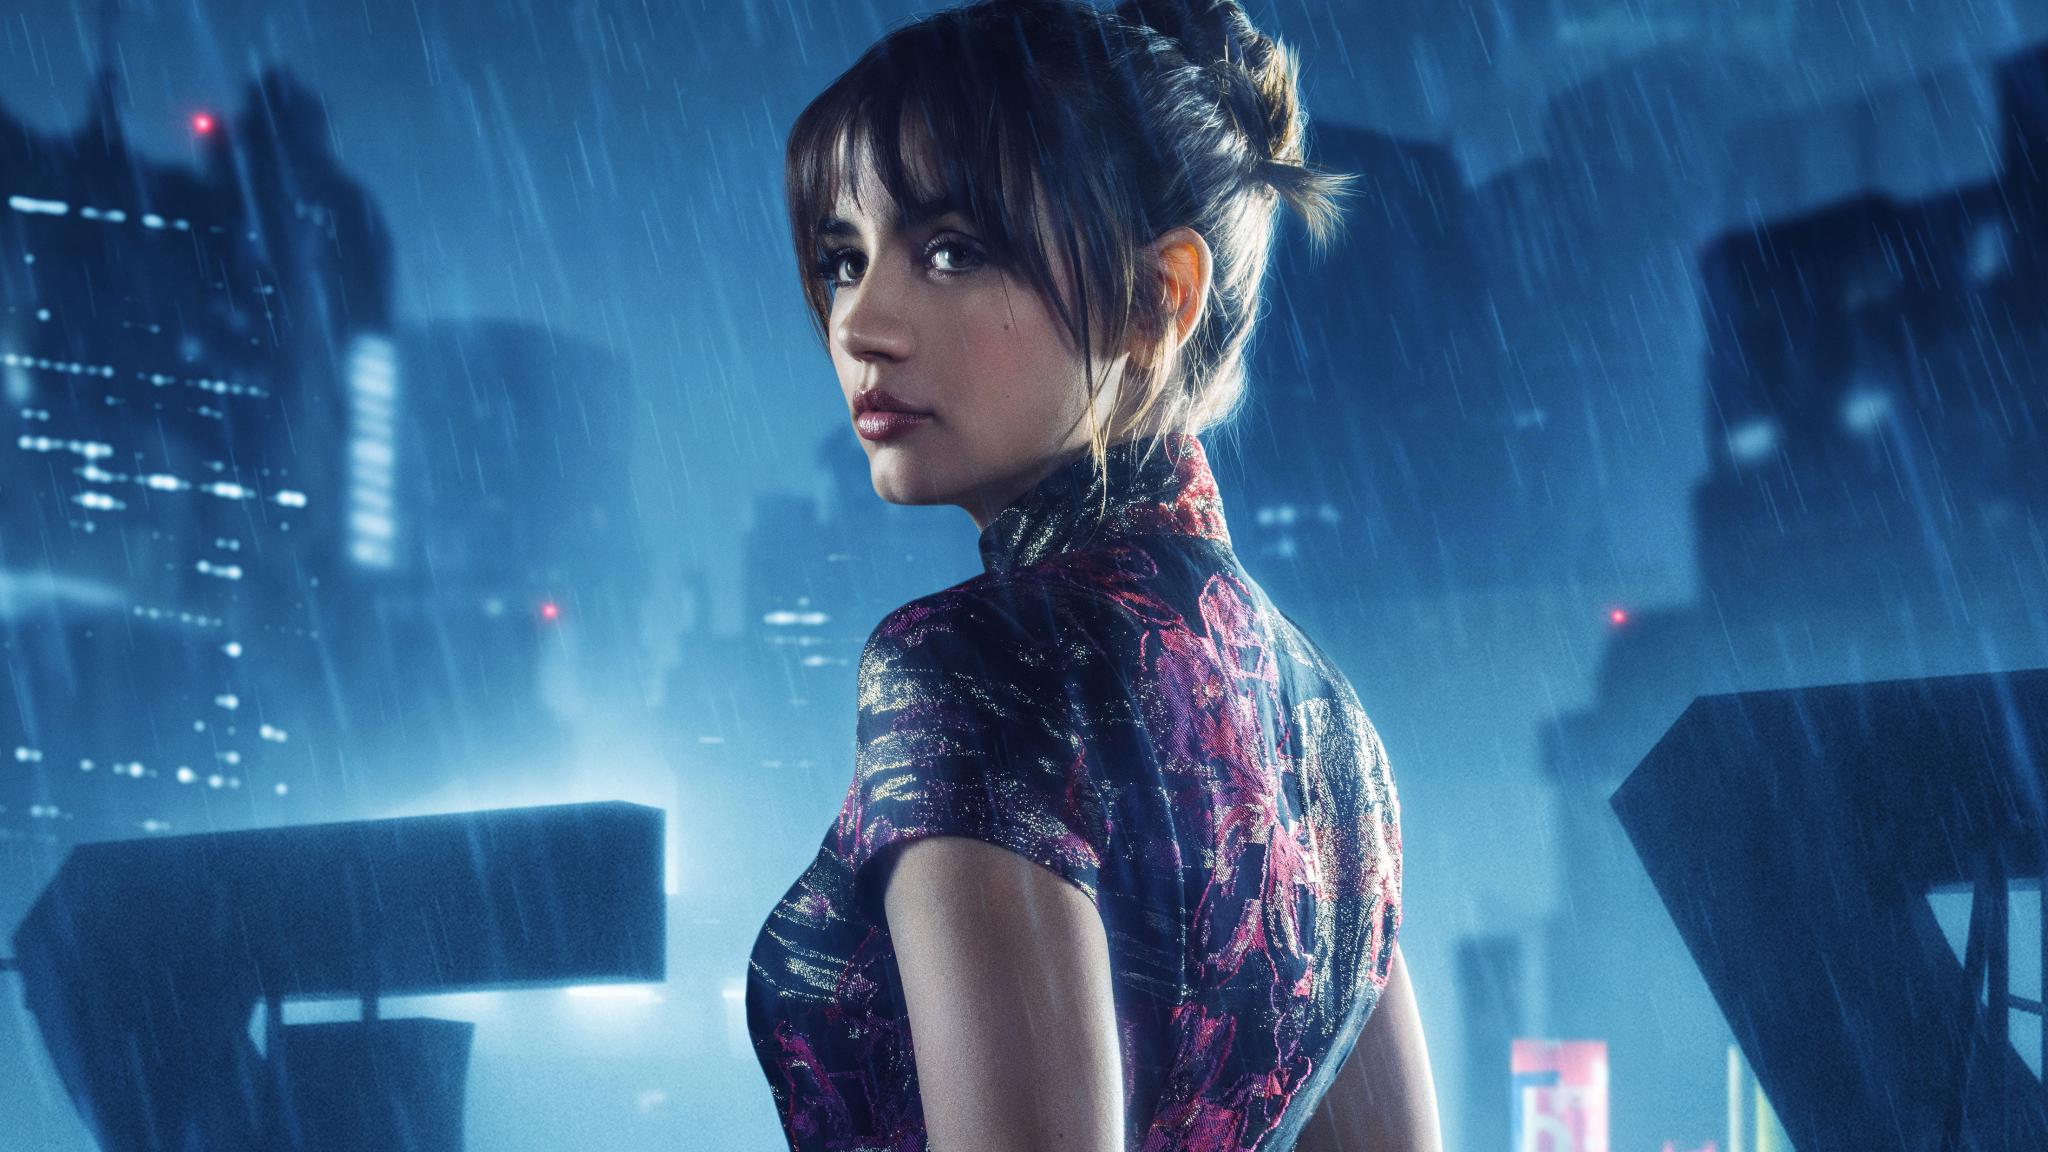 Ana De Armas As Joi In Blade Runner 2049 Hd 4k Wallpaper